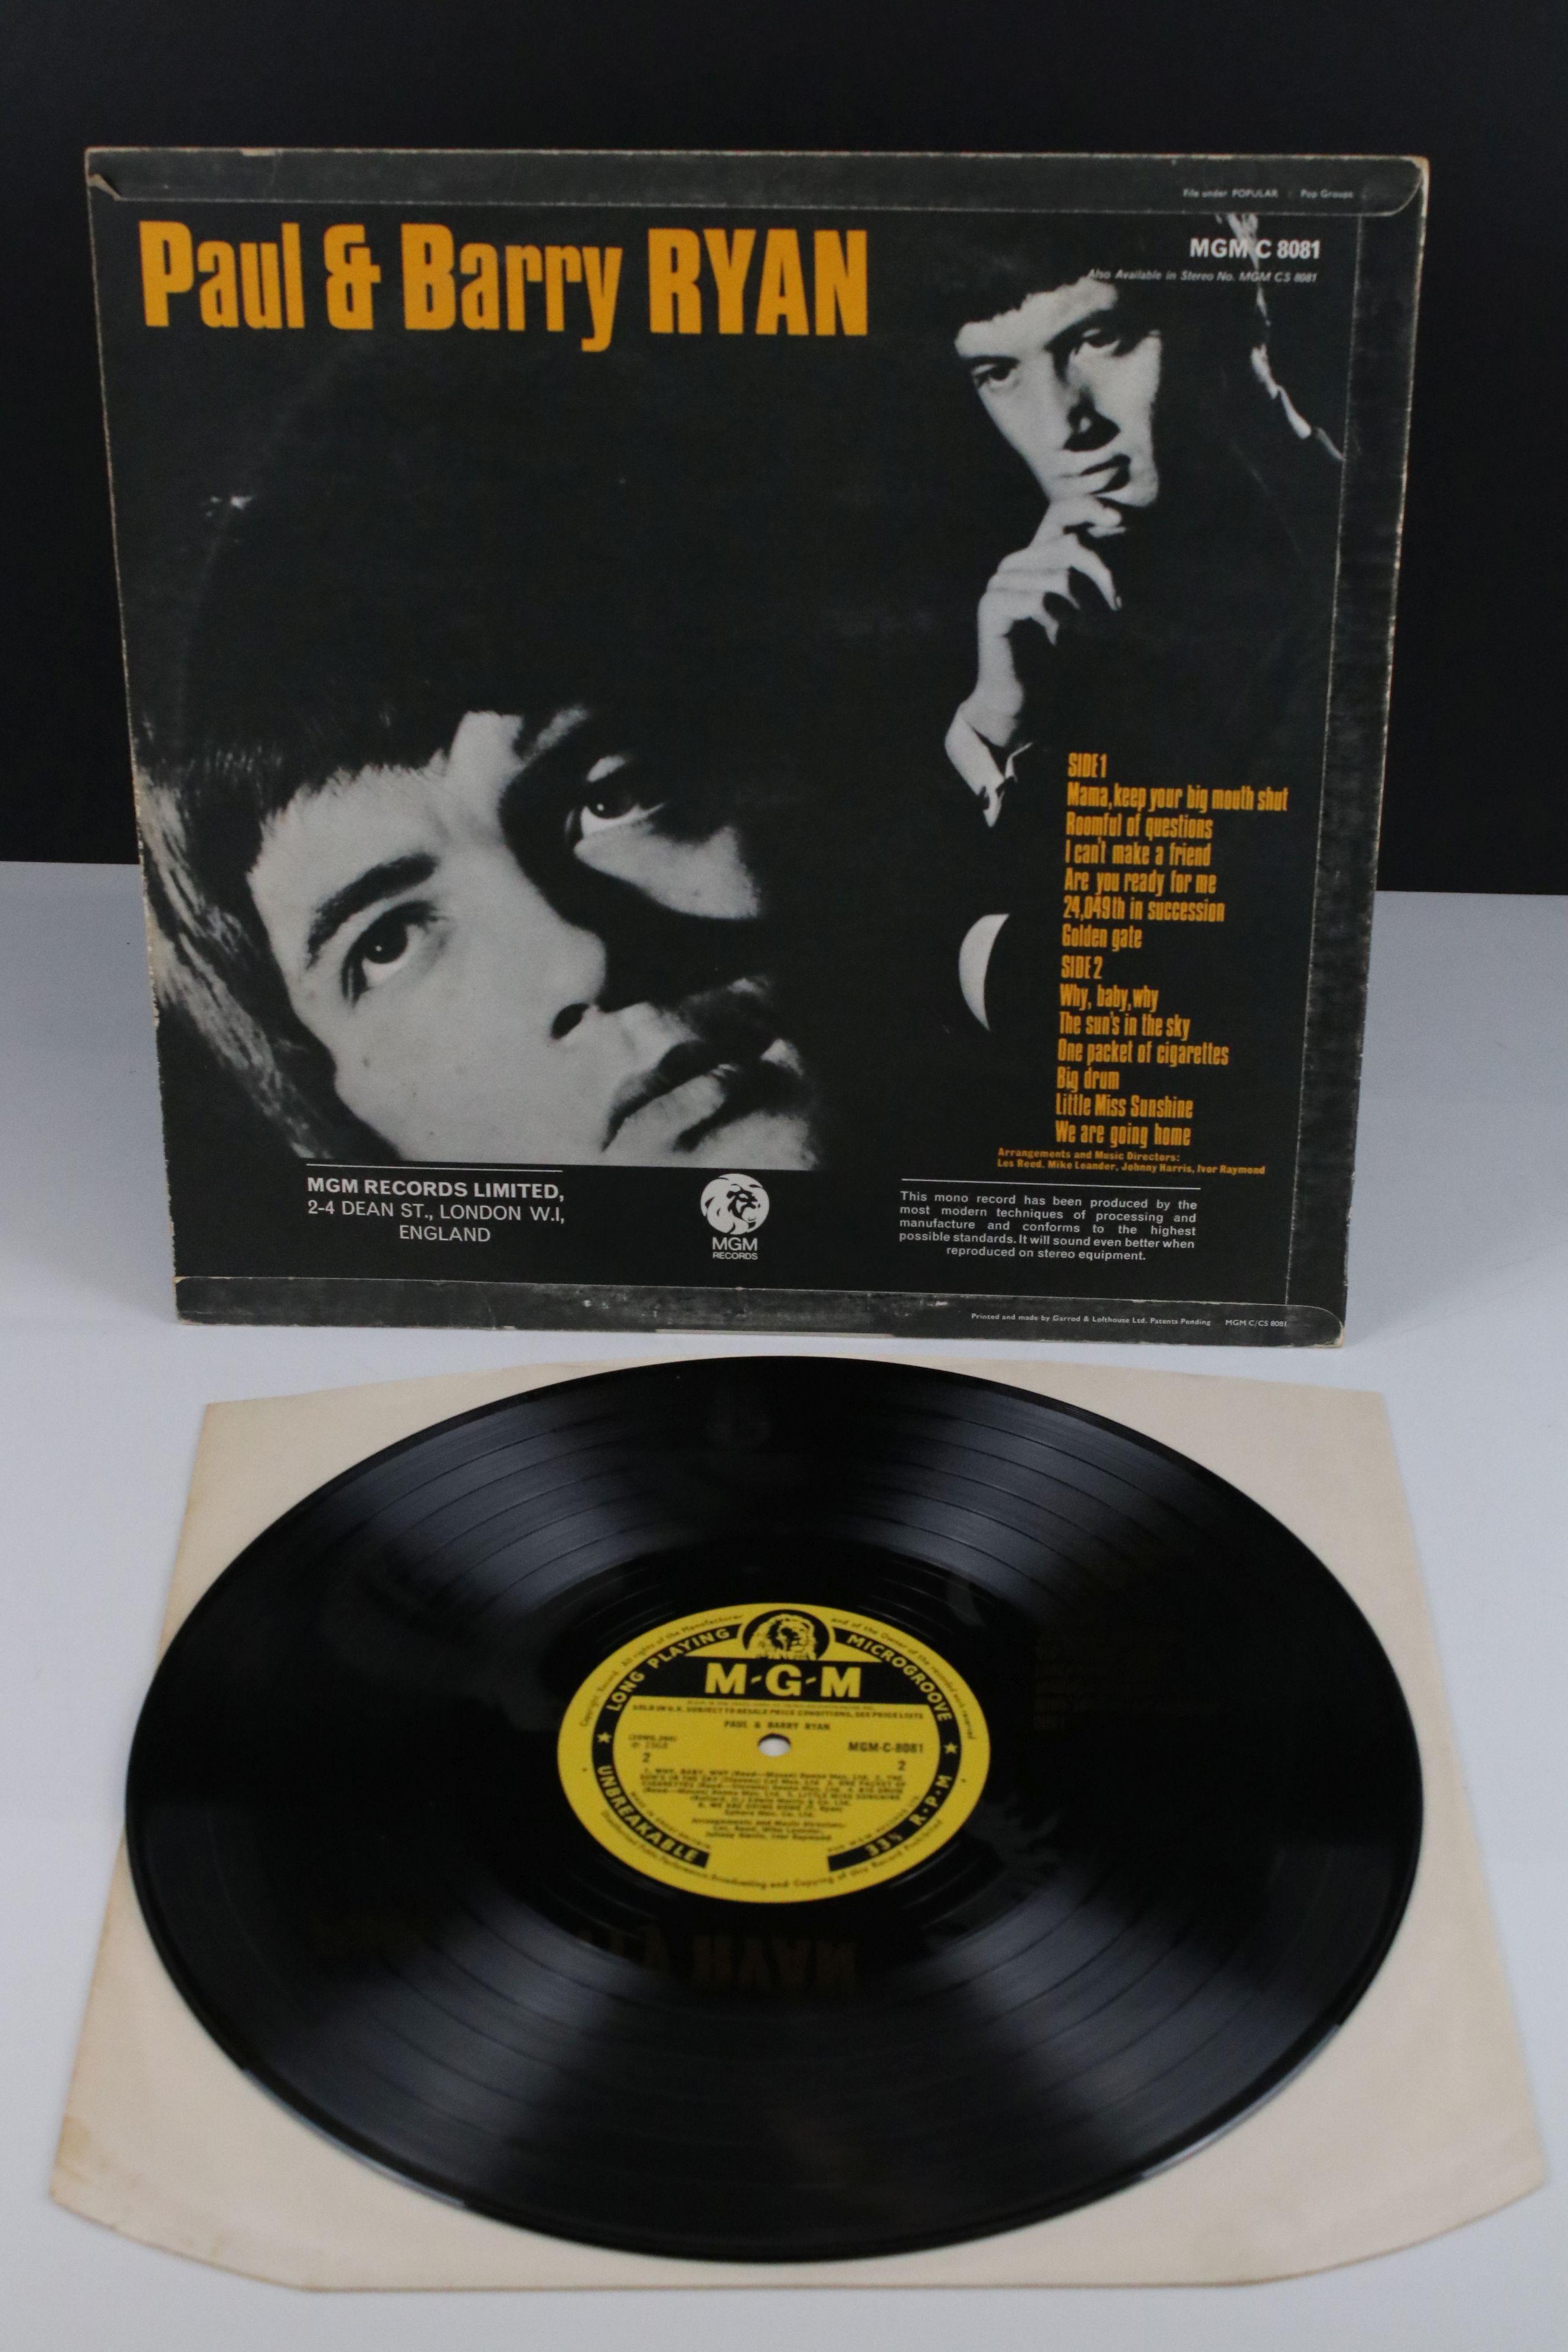 Vinyl - MOD/BEAT Paul & Barry Ryan self titled LP on MGM C 8081, mono non laminated, flip back - Image 2 of 5